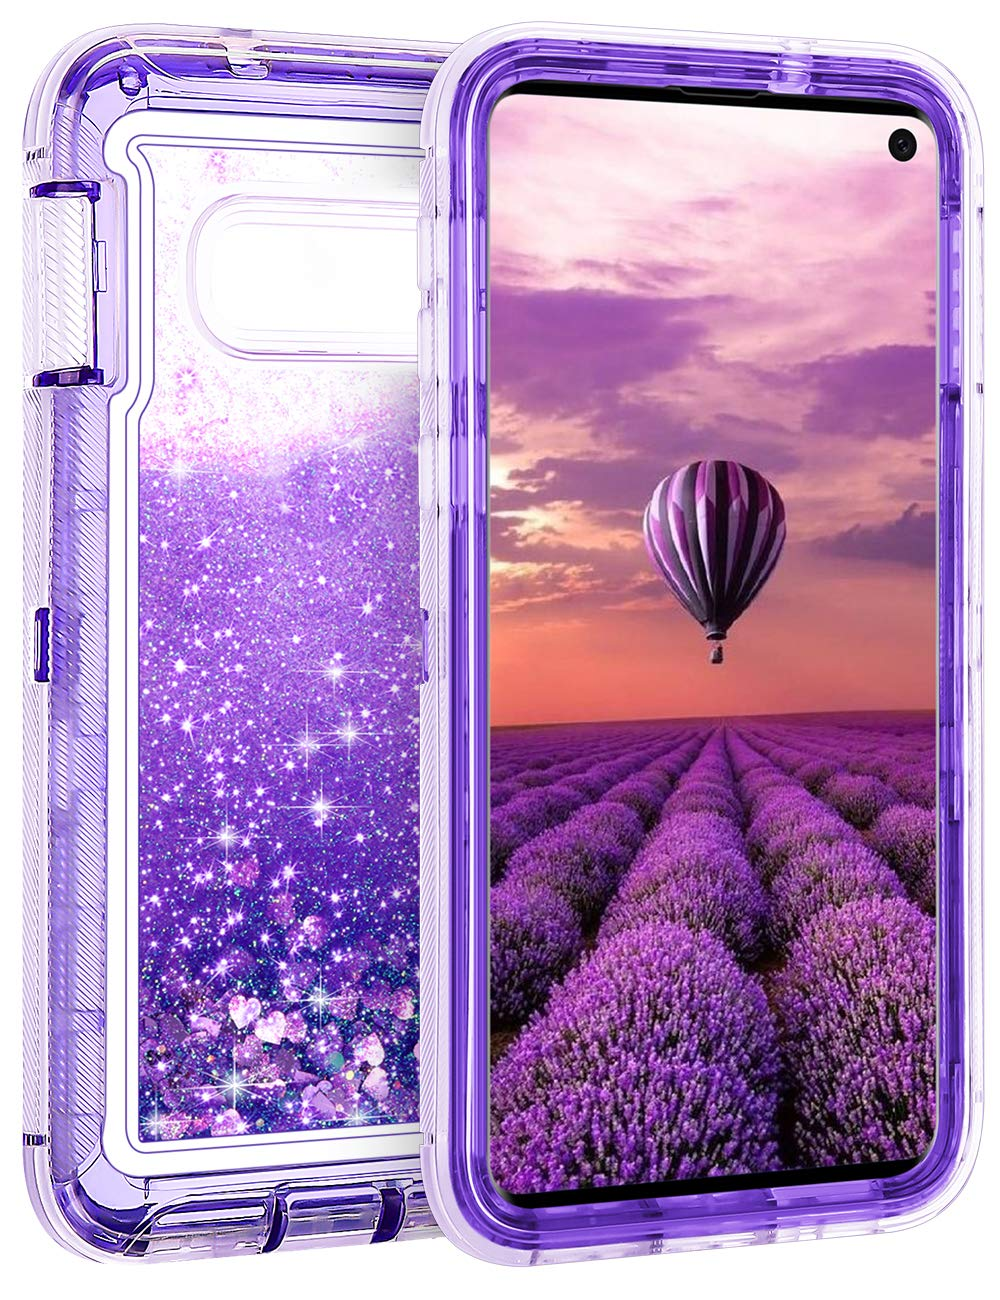 Funda Para Samsung S10e Glitter Coolden (7pjpcy1j)